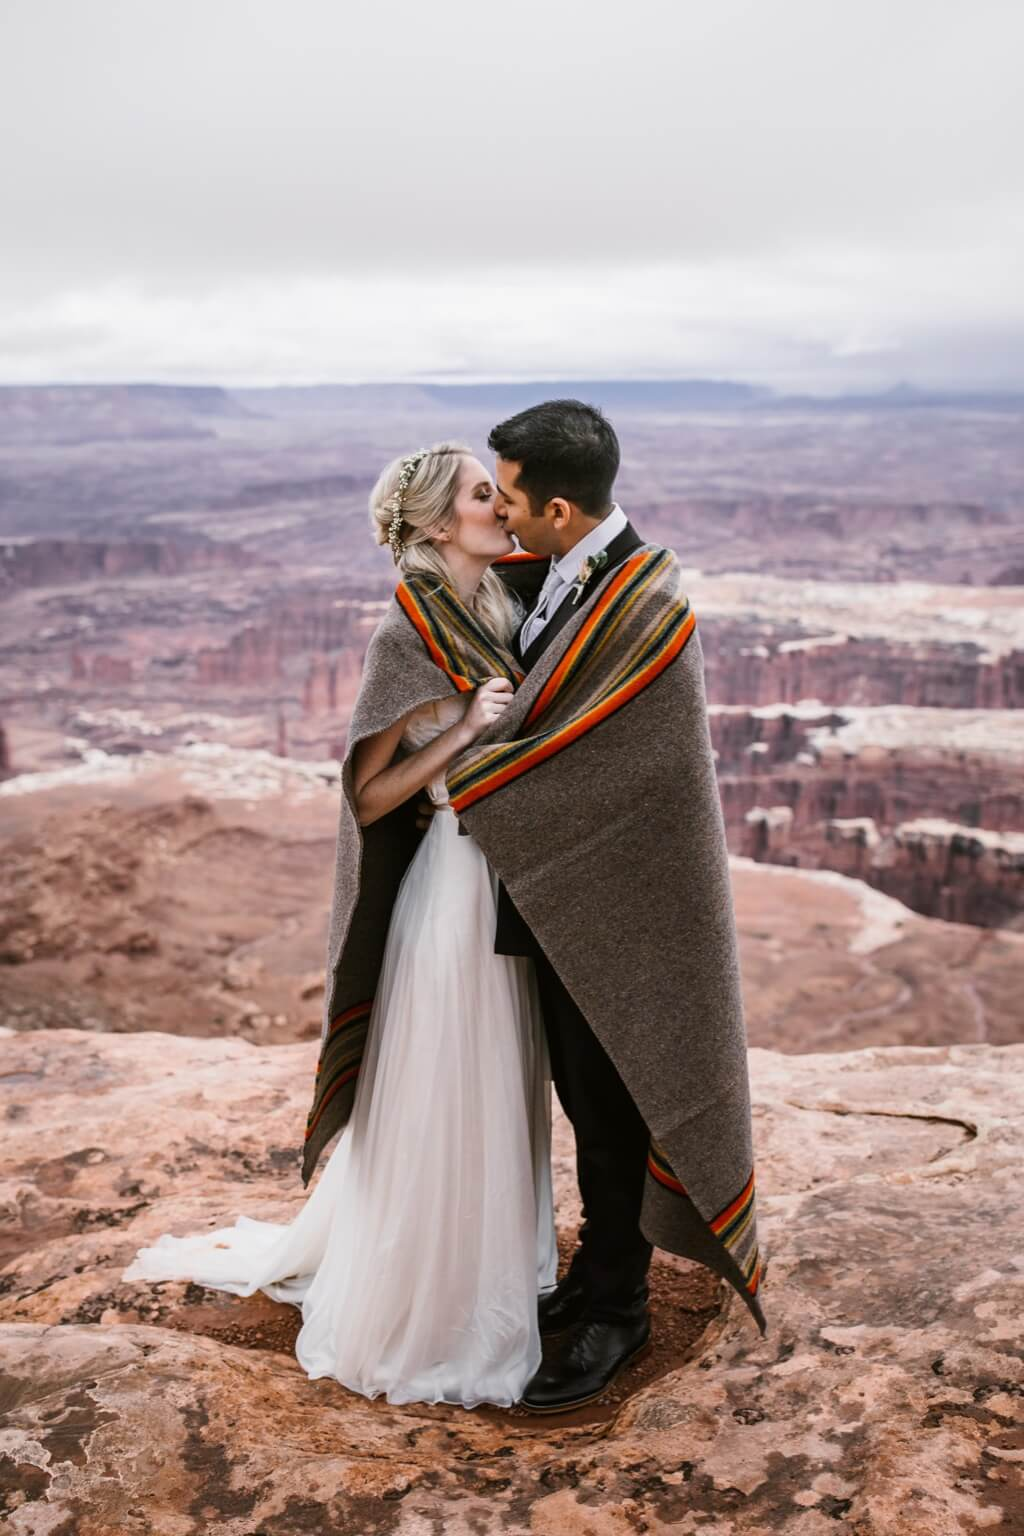 Hearnes Elopement Photography - Canyonlands National Park Moab Wedding